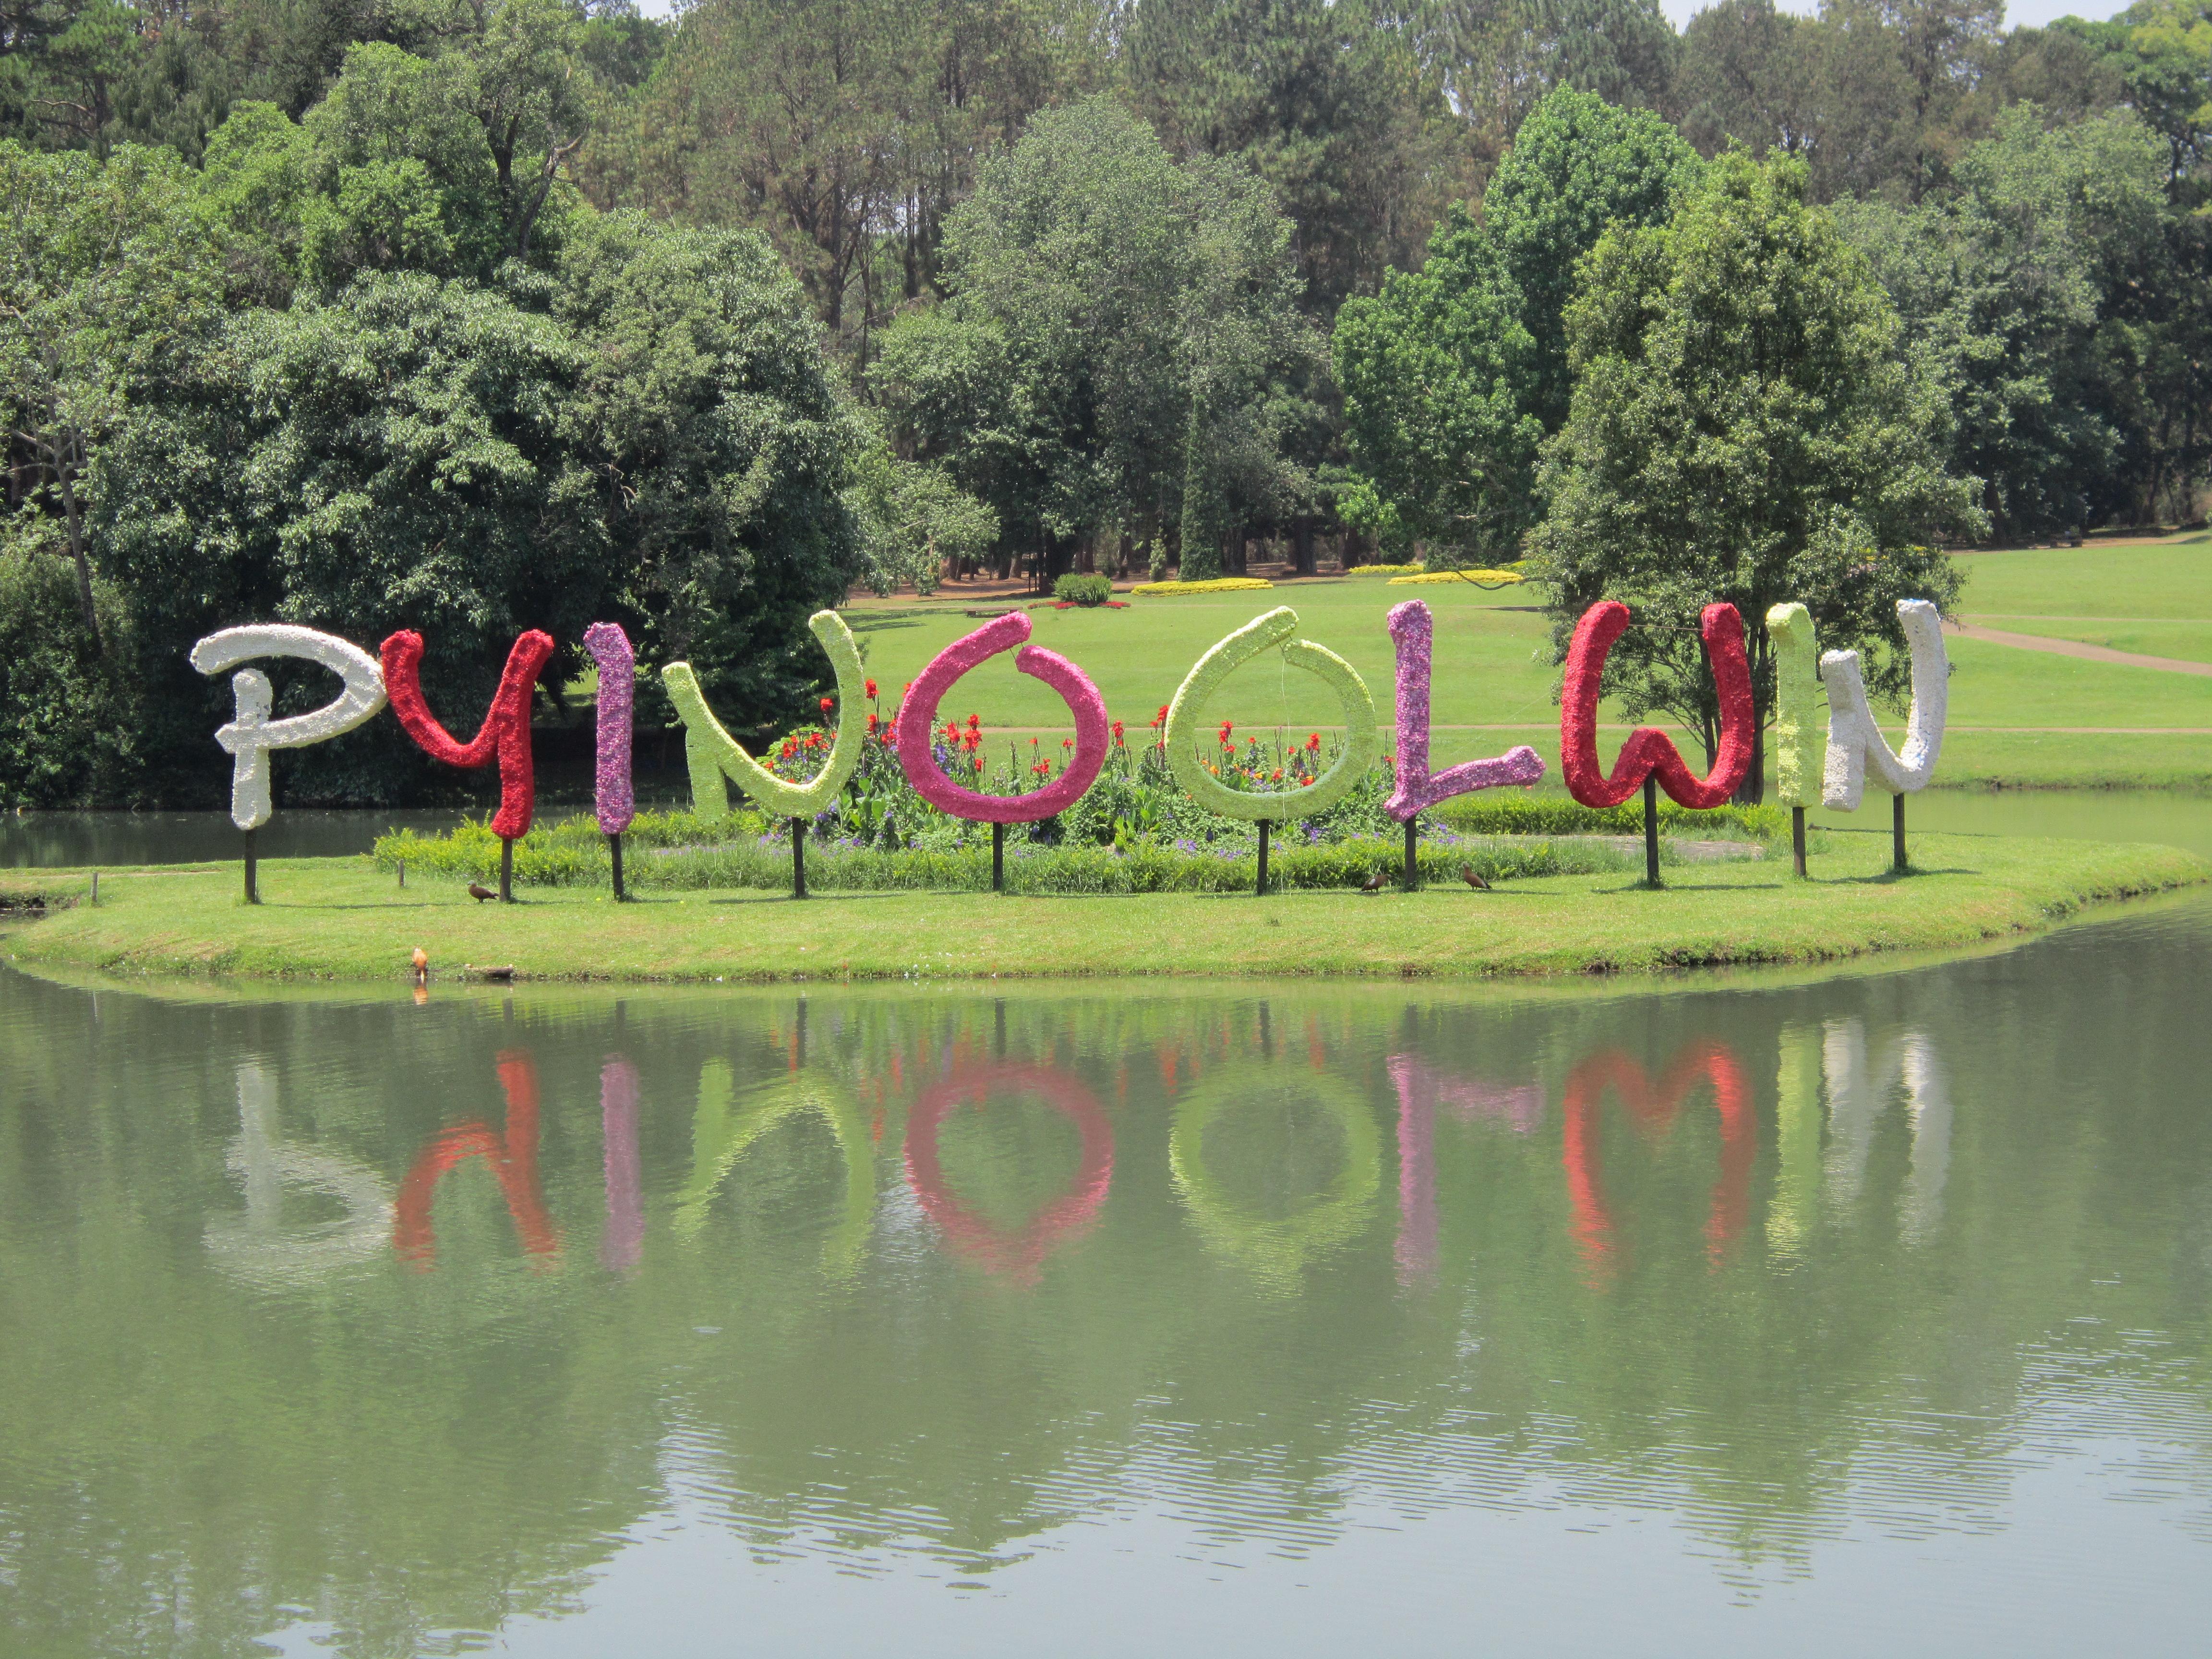 Pyin Oo Lwin spelt by floral decorations, Kandawgyi Botanical Gardens , Myanmar